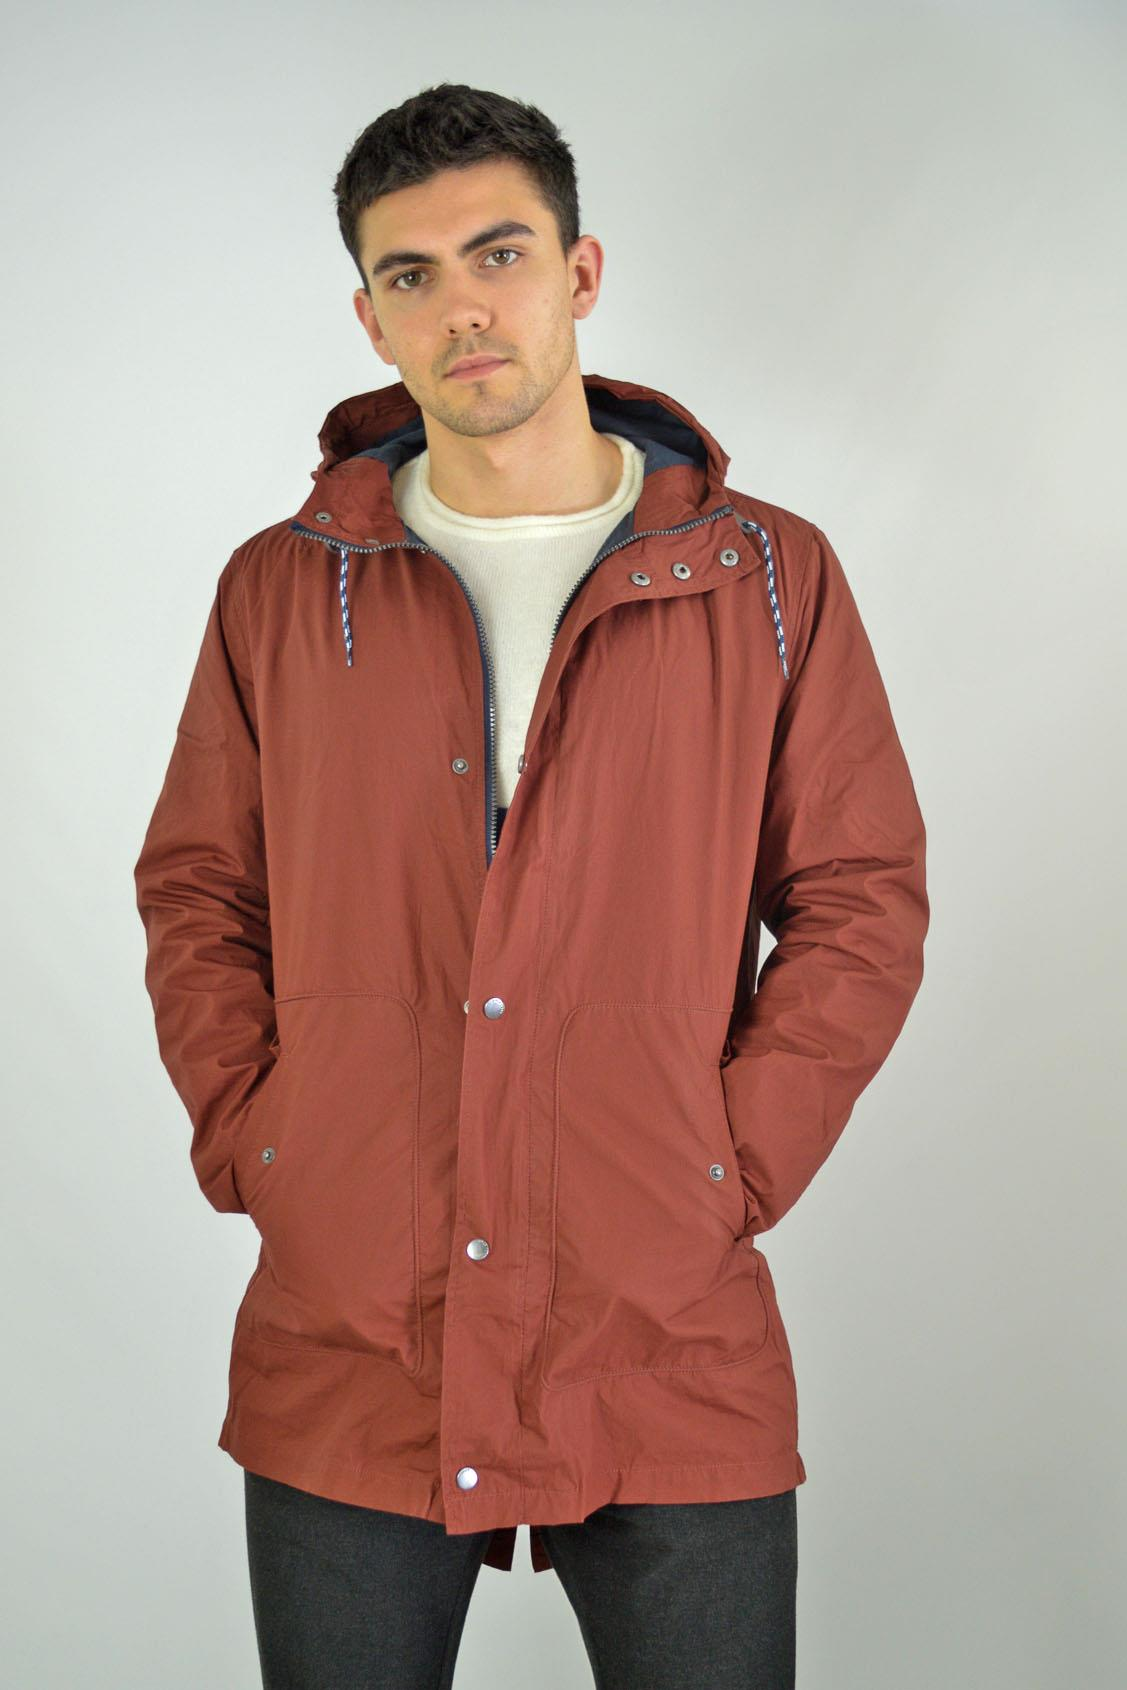 BURTON Mens Burgundy Rainwear Parka Jacket Long Length RRP £55